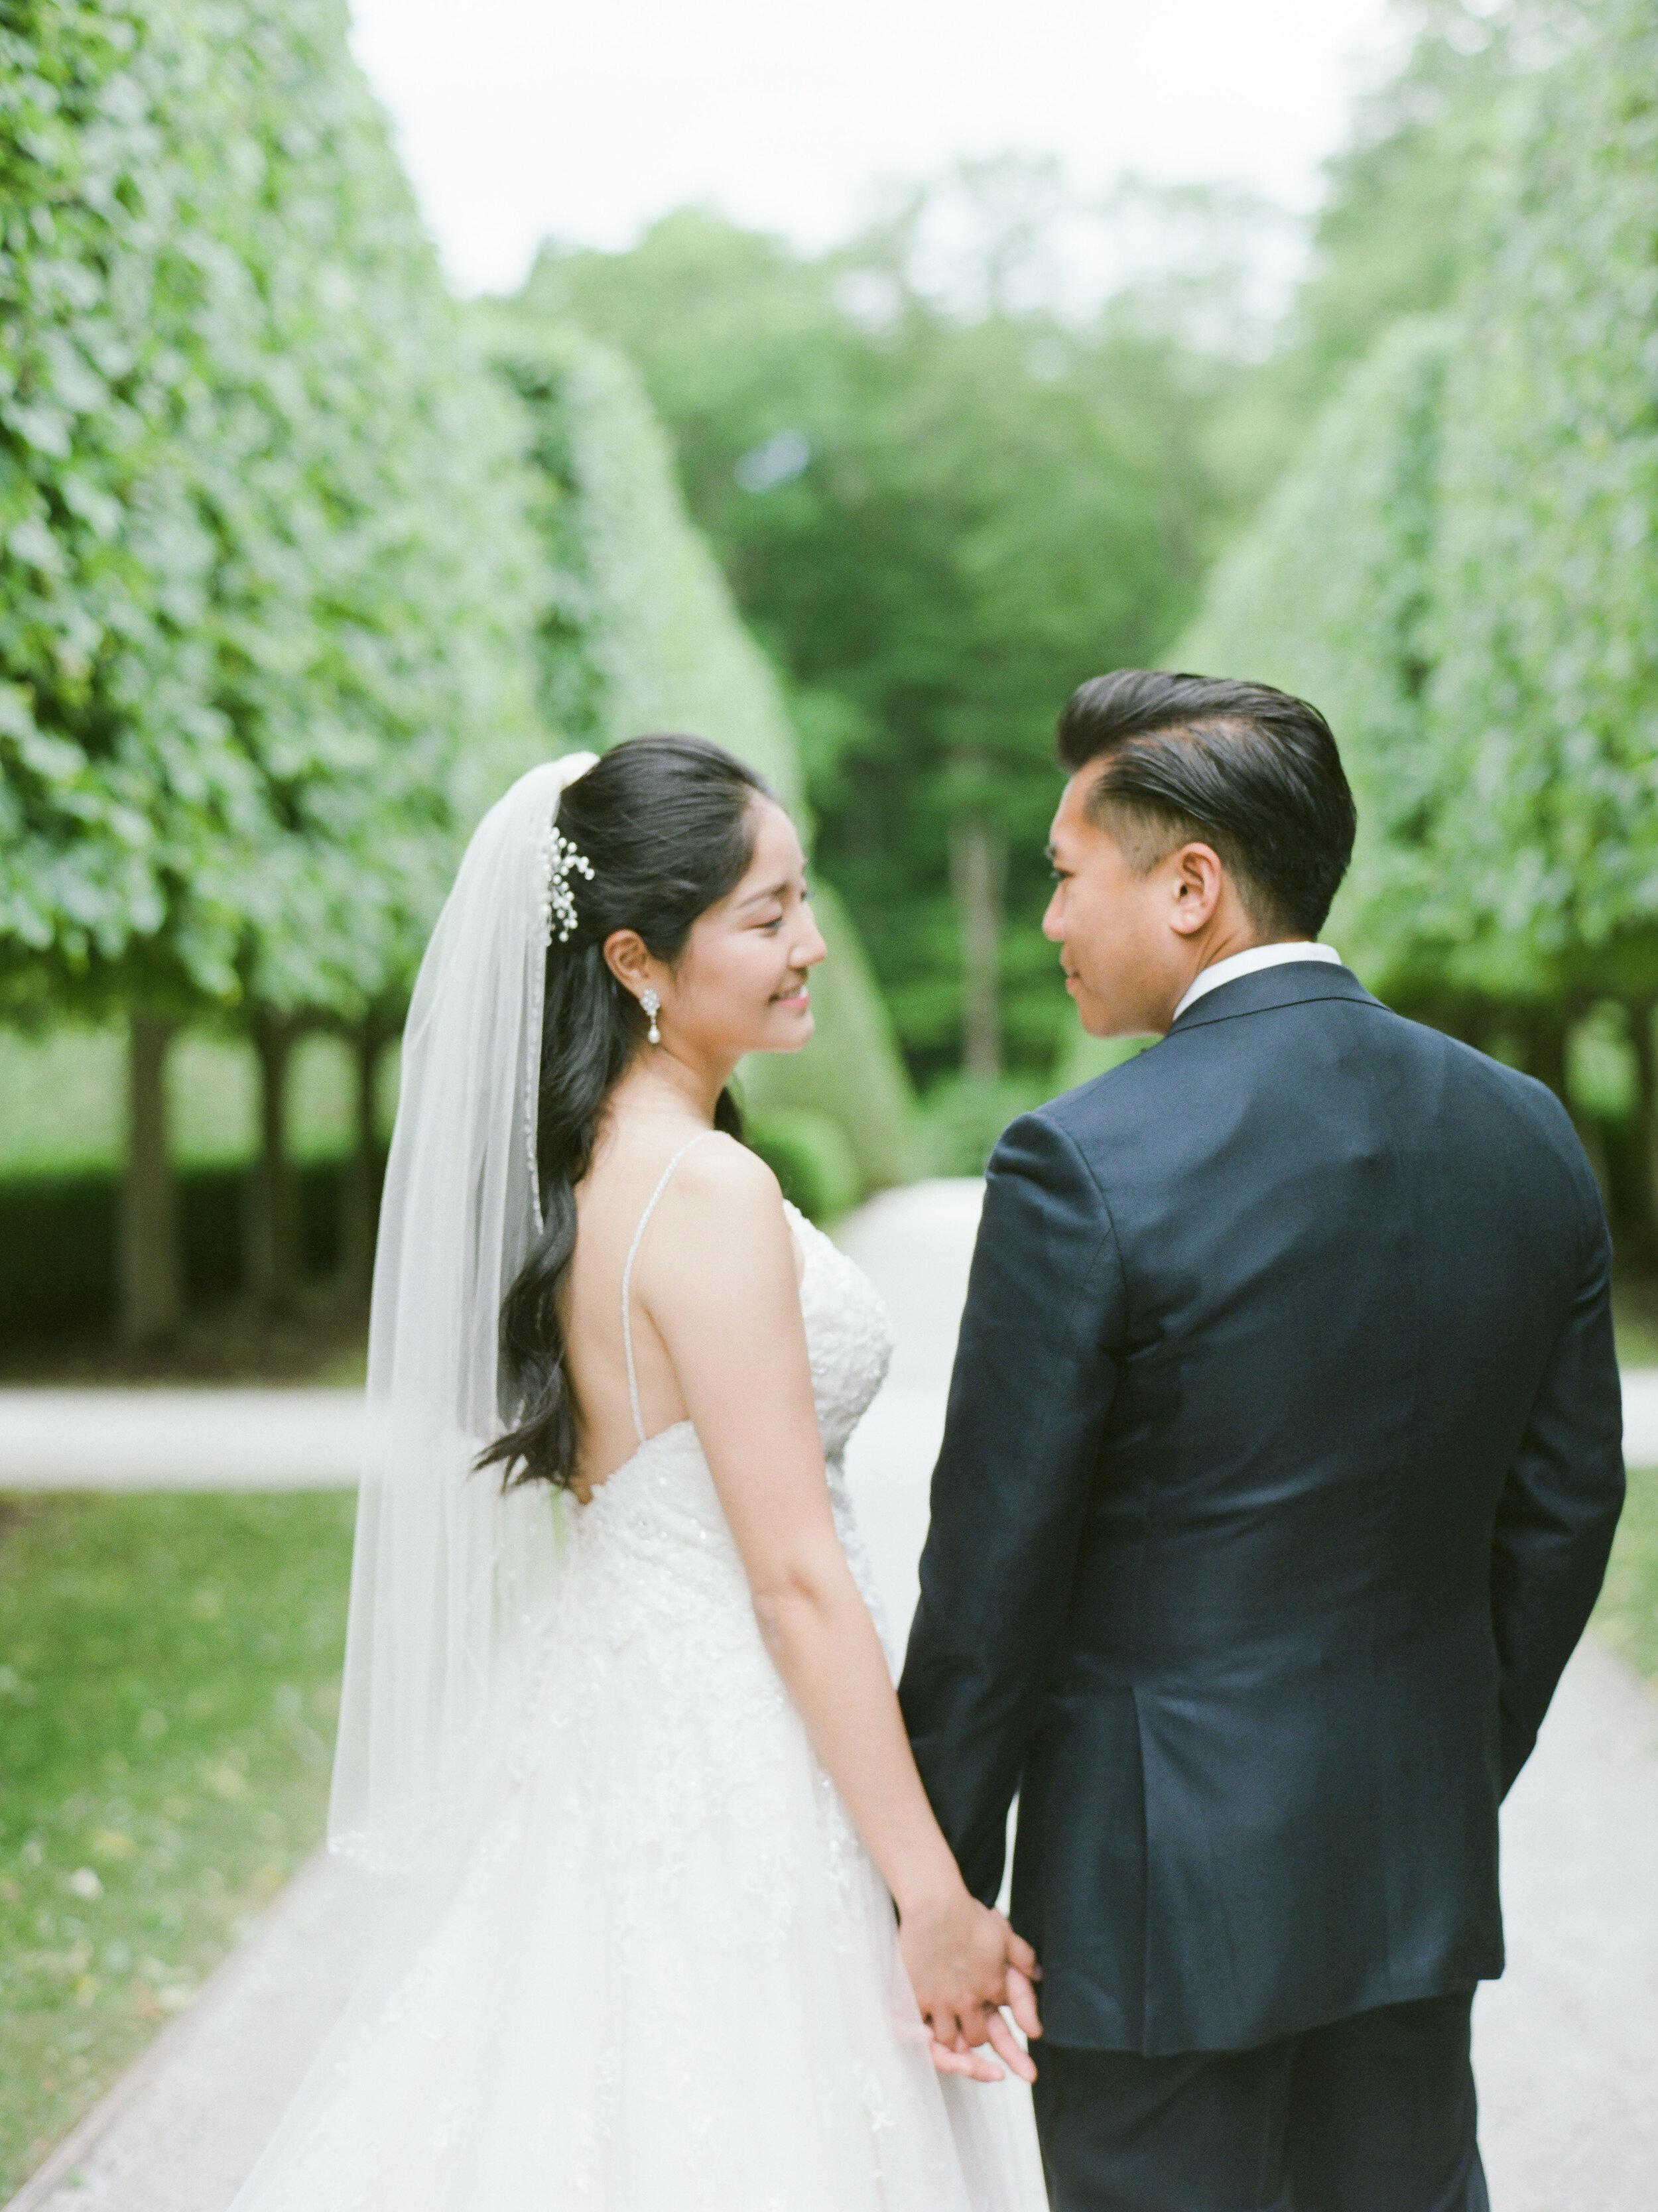 Wedding Photographer in the Berkshires